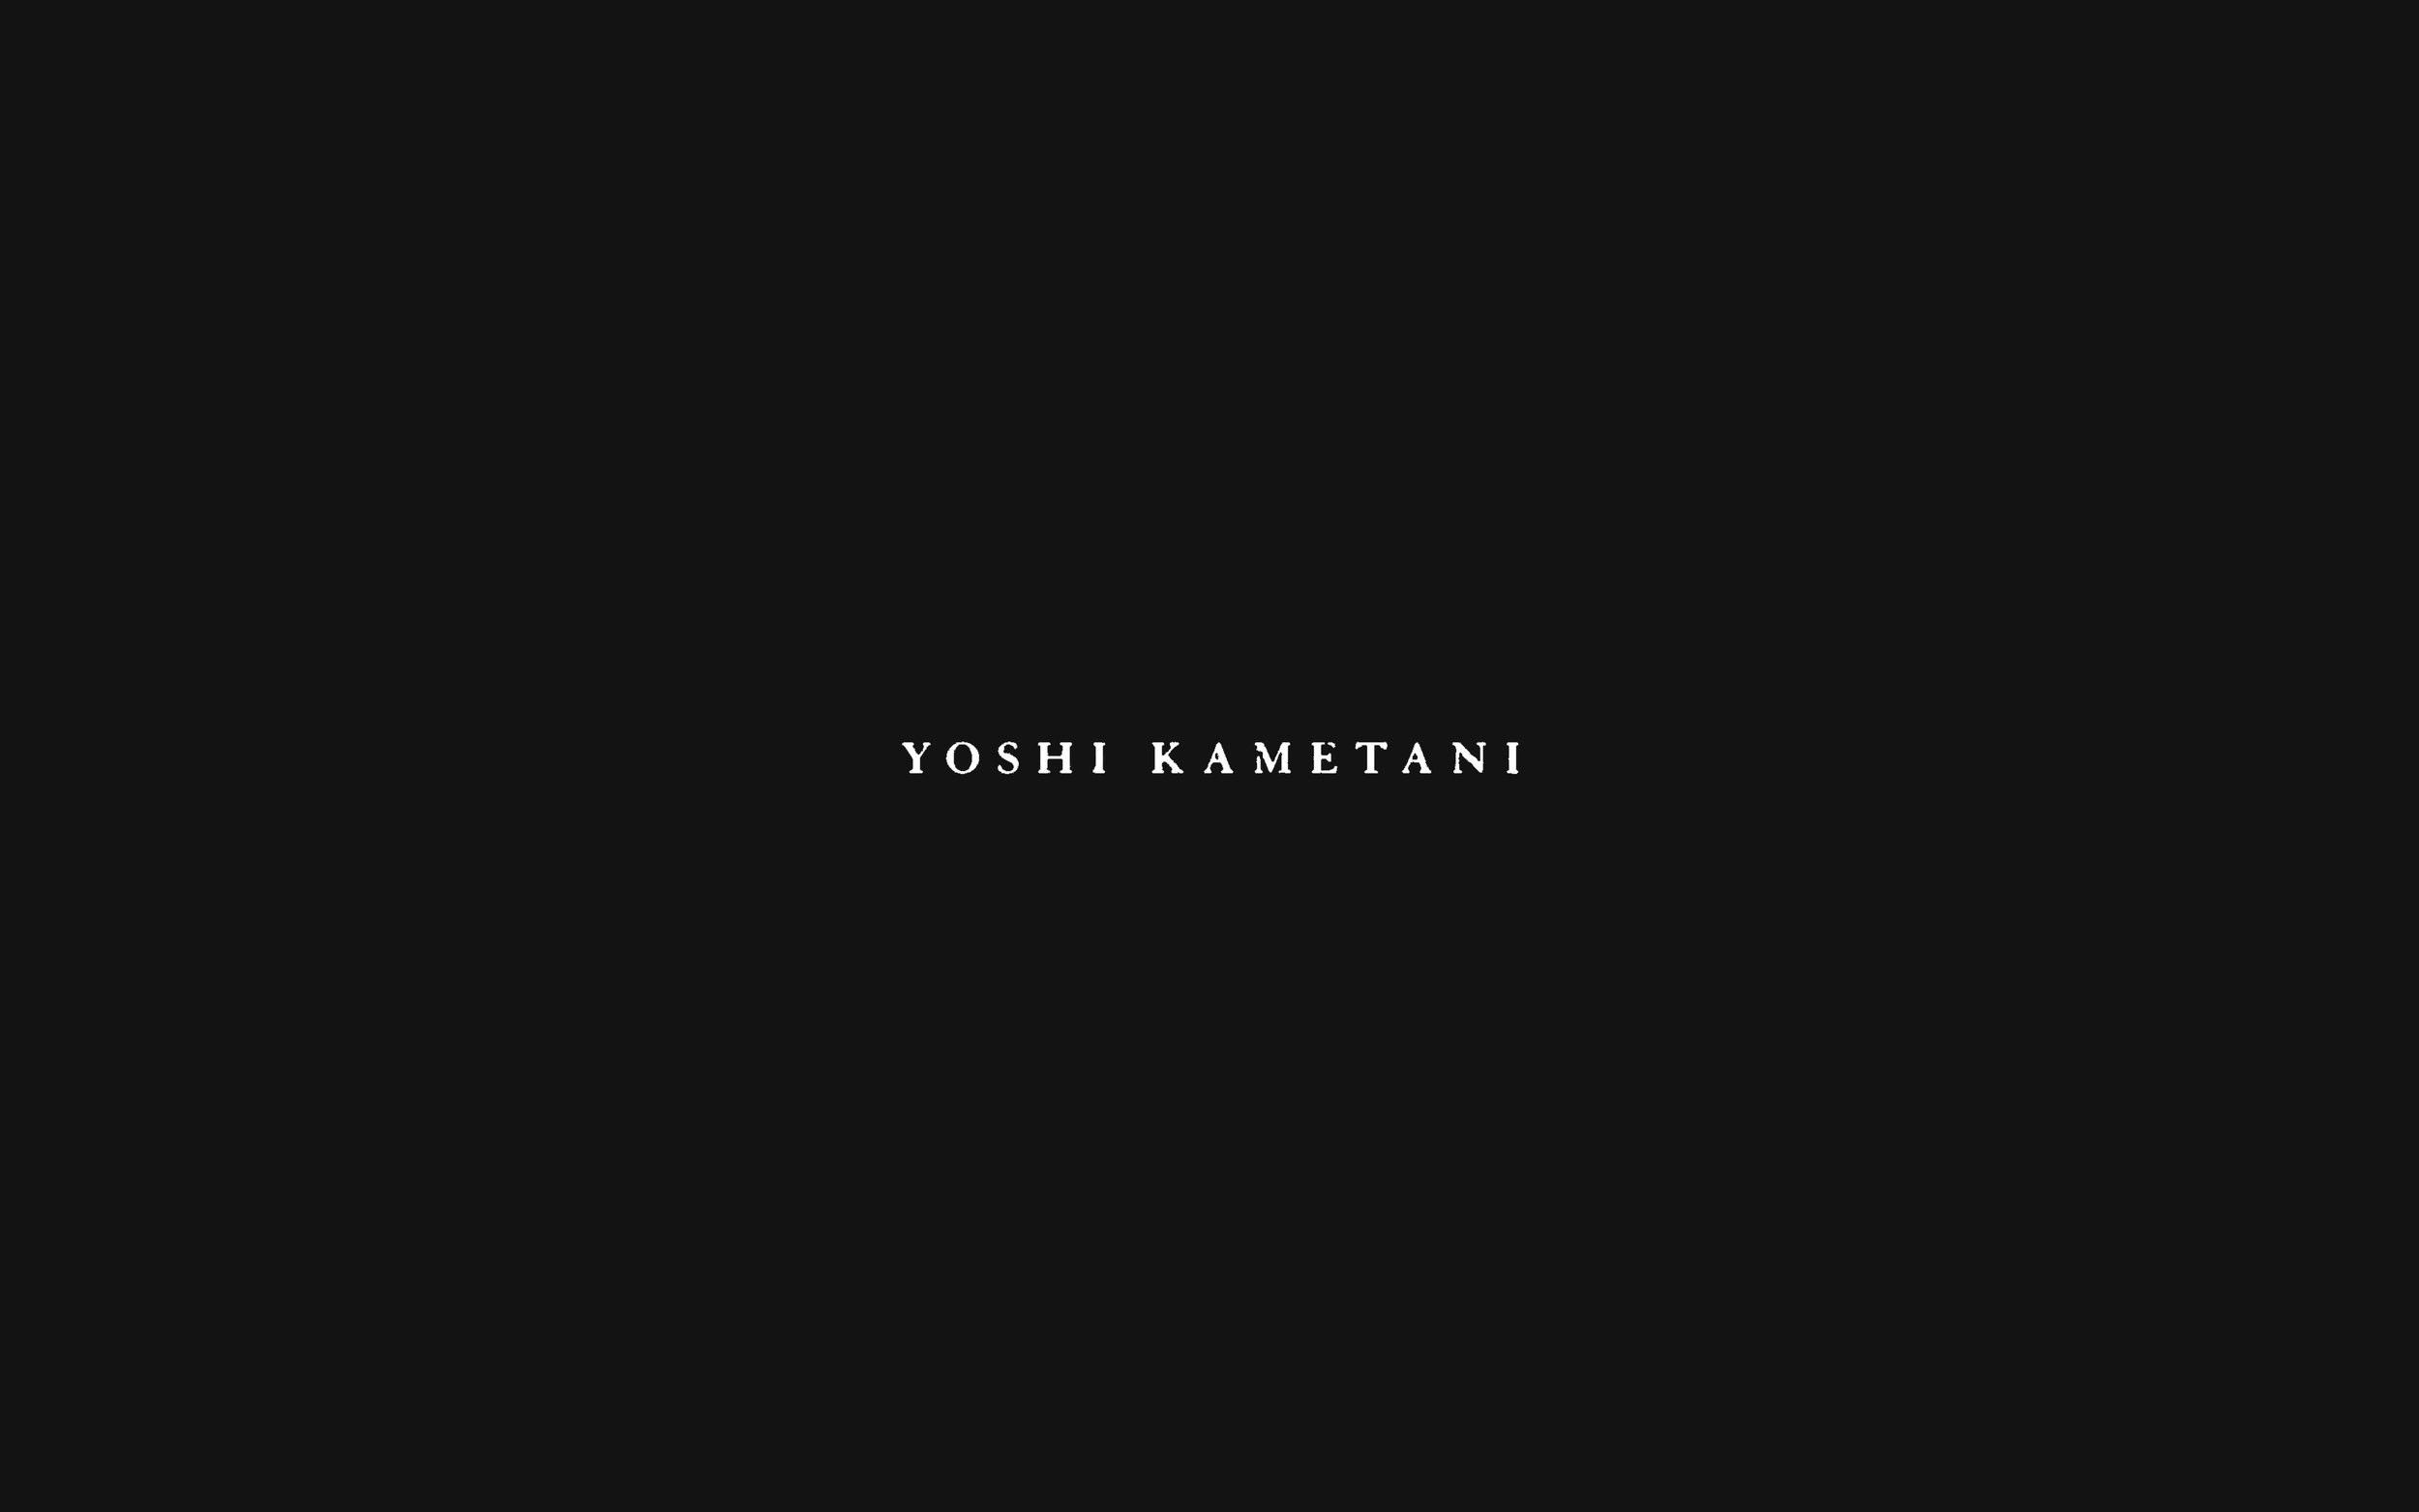 7B__Yoshi_Kametani_00.jpg